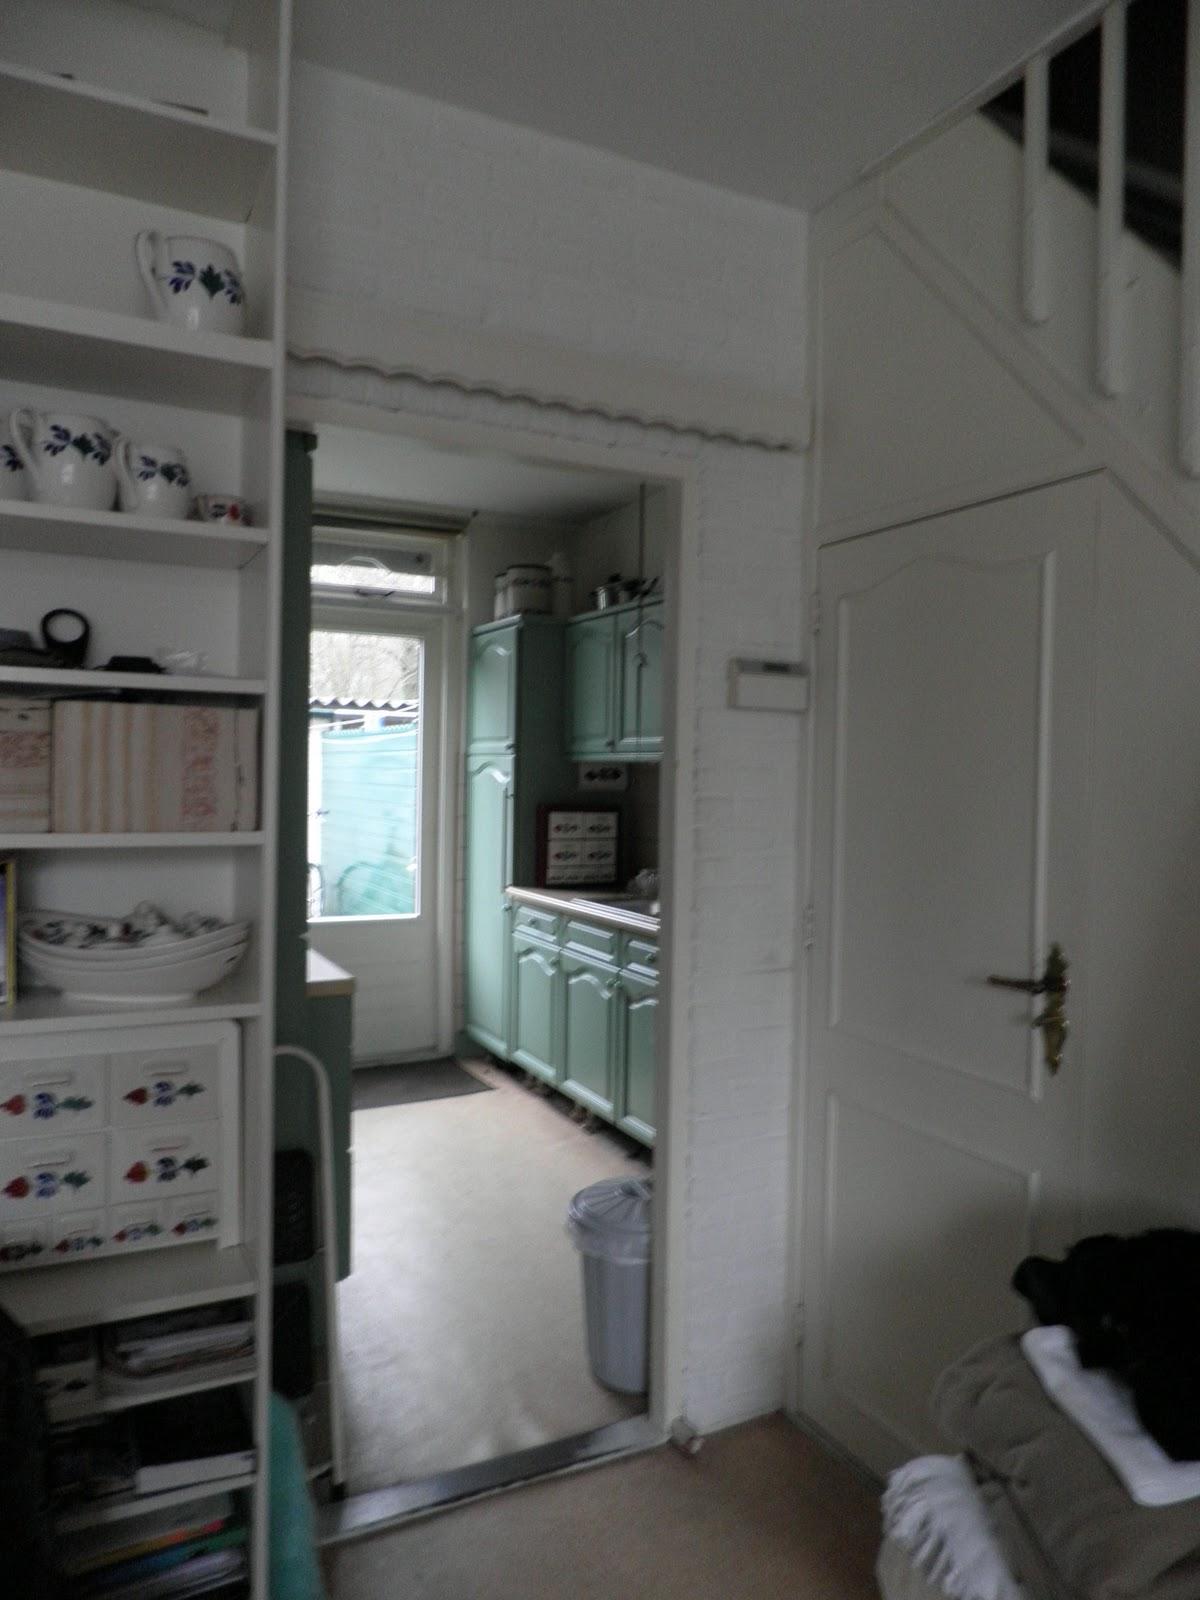 Bolusjes huis en honden oude keuken afbreken